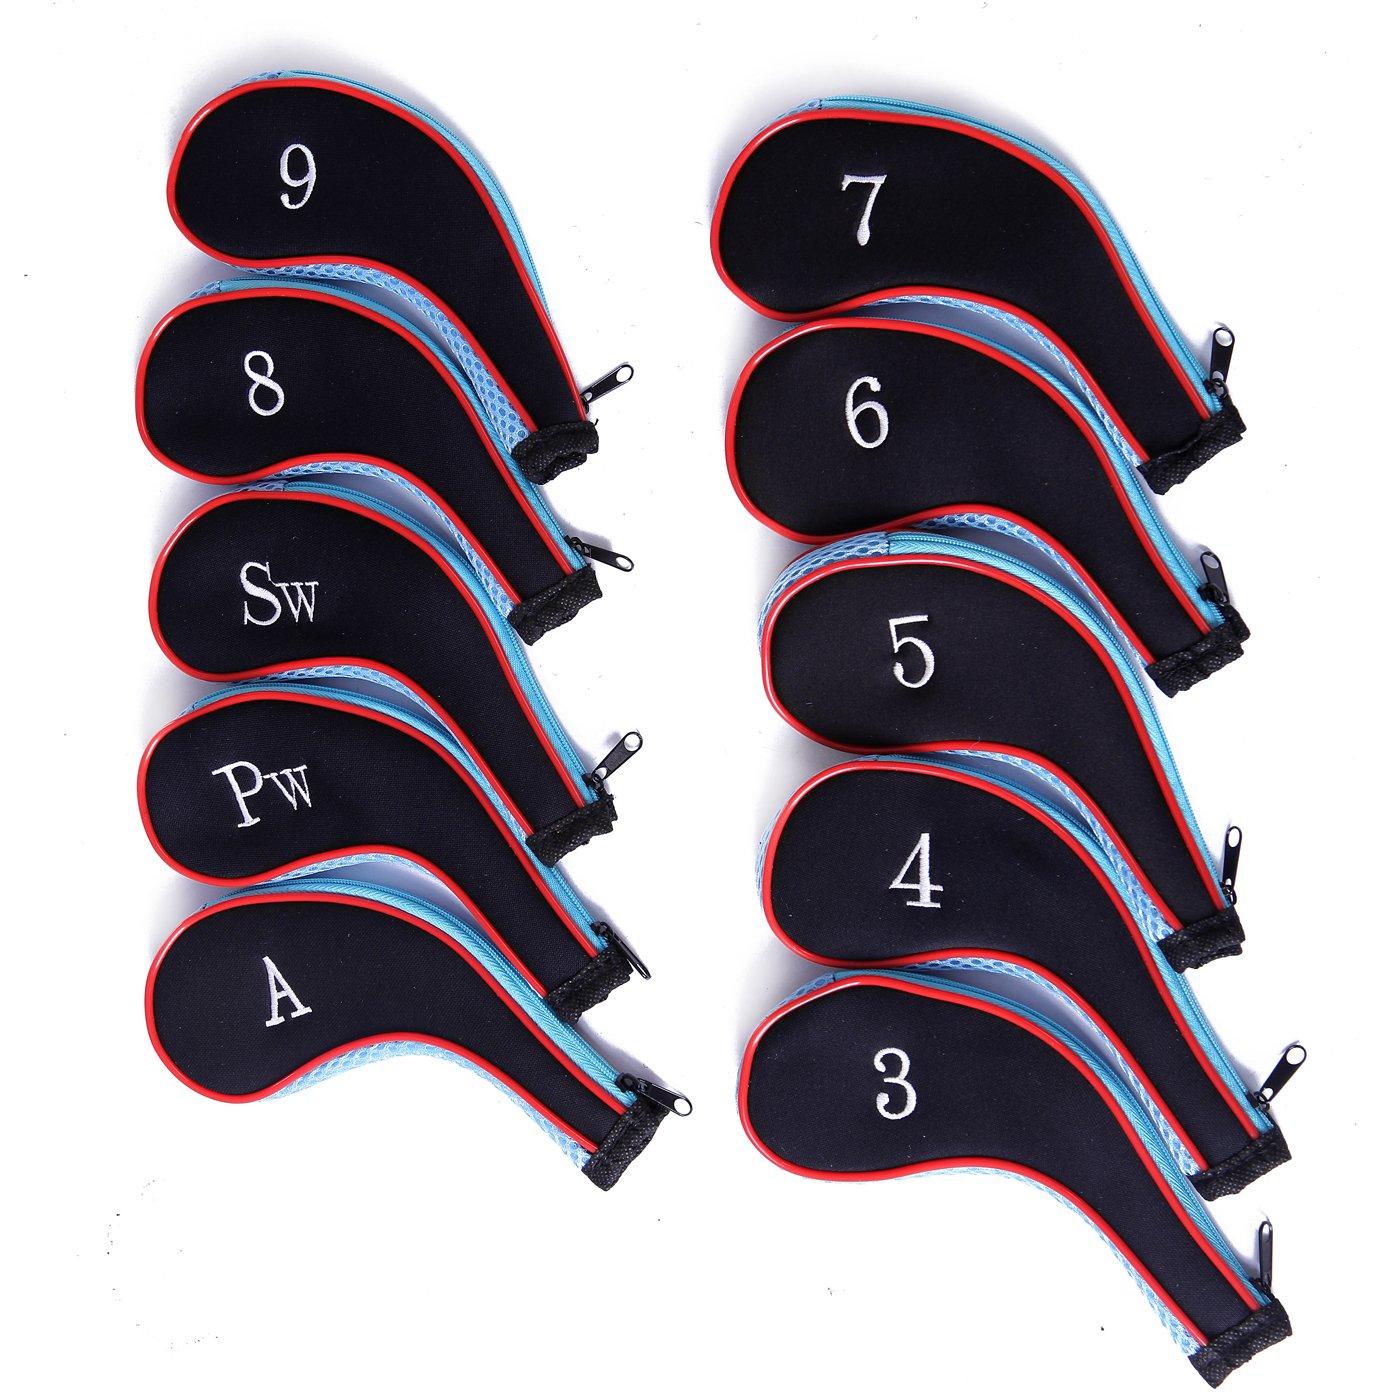 HDE Neoprene Zippered Golf Club Iron Covers - Set of 10 (Blue)